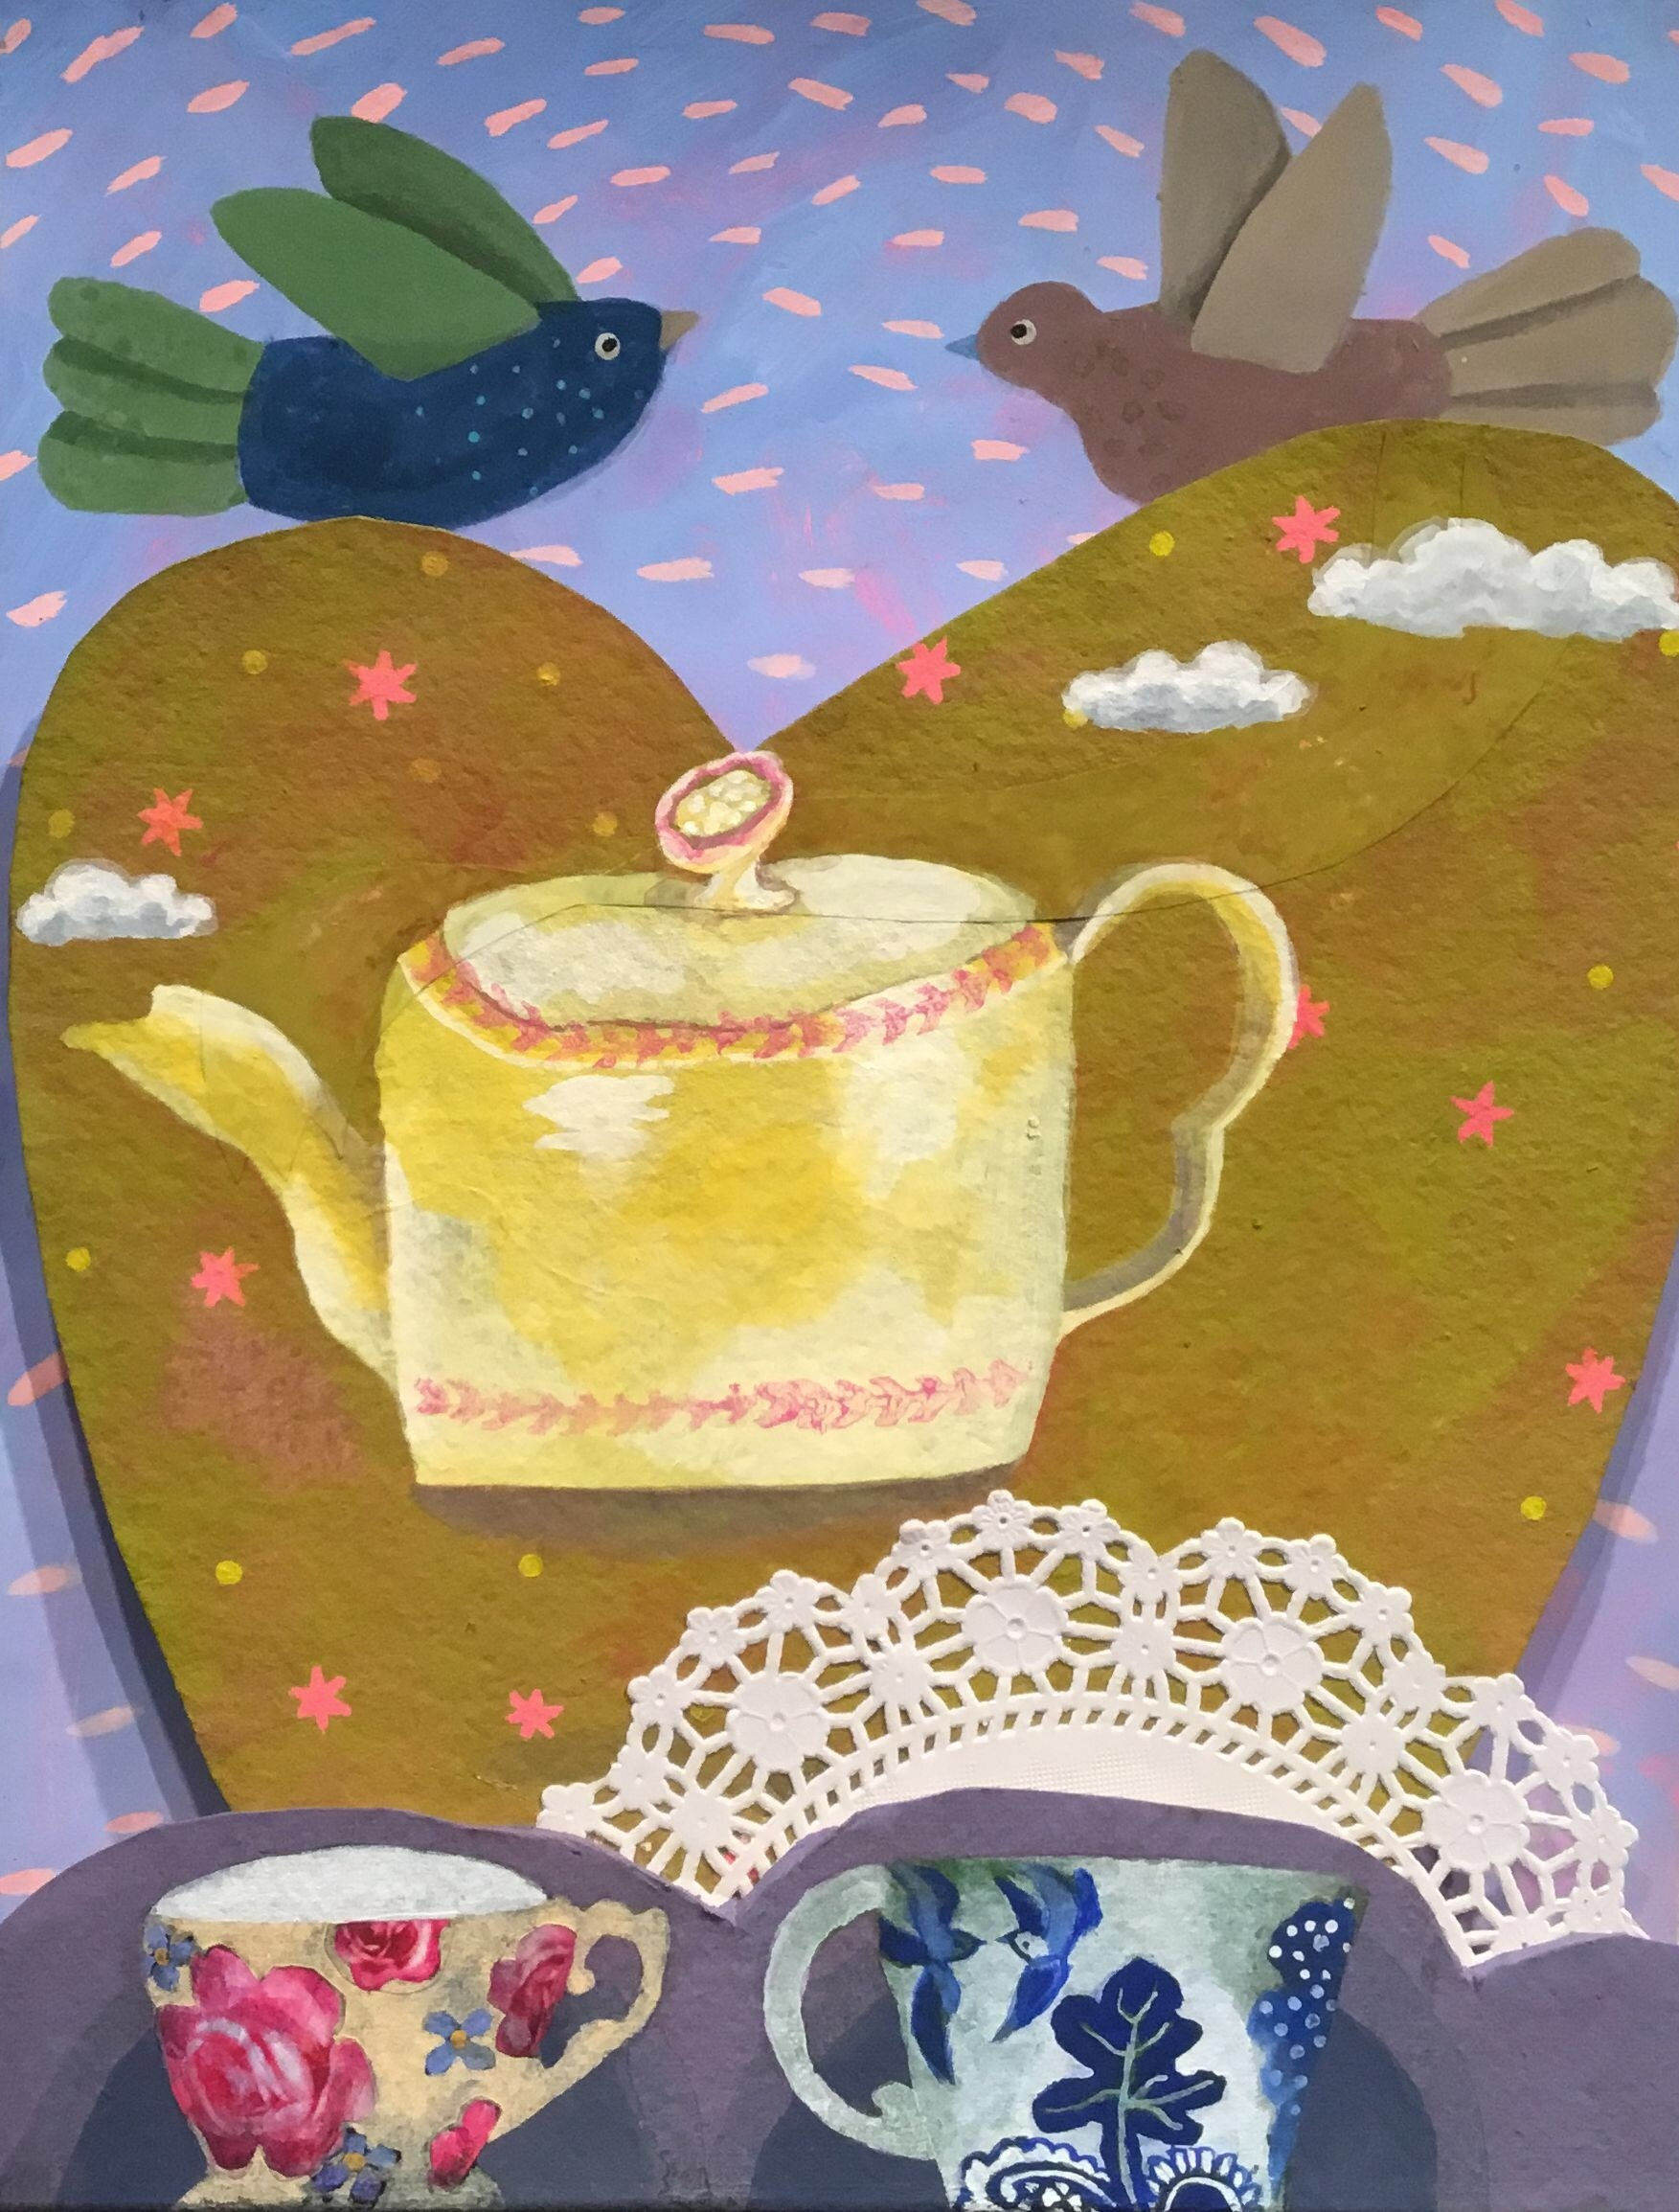 "<span class=""link fancybox-details-link""><a href=""/artists/146-gertie-young/works/10979-gertie-young-tea-drinker-s-delight/"">View Detail Page</a></span><div class=""artist""><span class=""artist""><strong>Gertie Young</strong></span></div><div class=""title""><em>Tea Drinker's Delight</em></div><div class=""medium"">watercolour and gouache collage</div><div class=""dimensions"">32x26x6cm</div><div class=""price"">£450.00</div>"